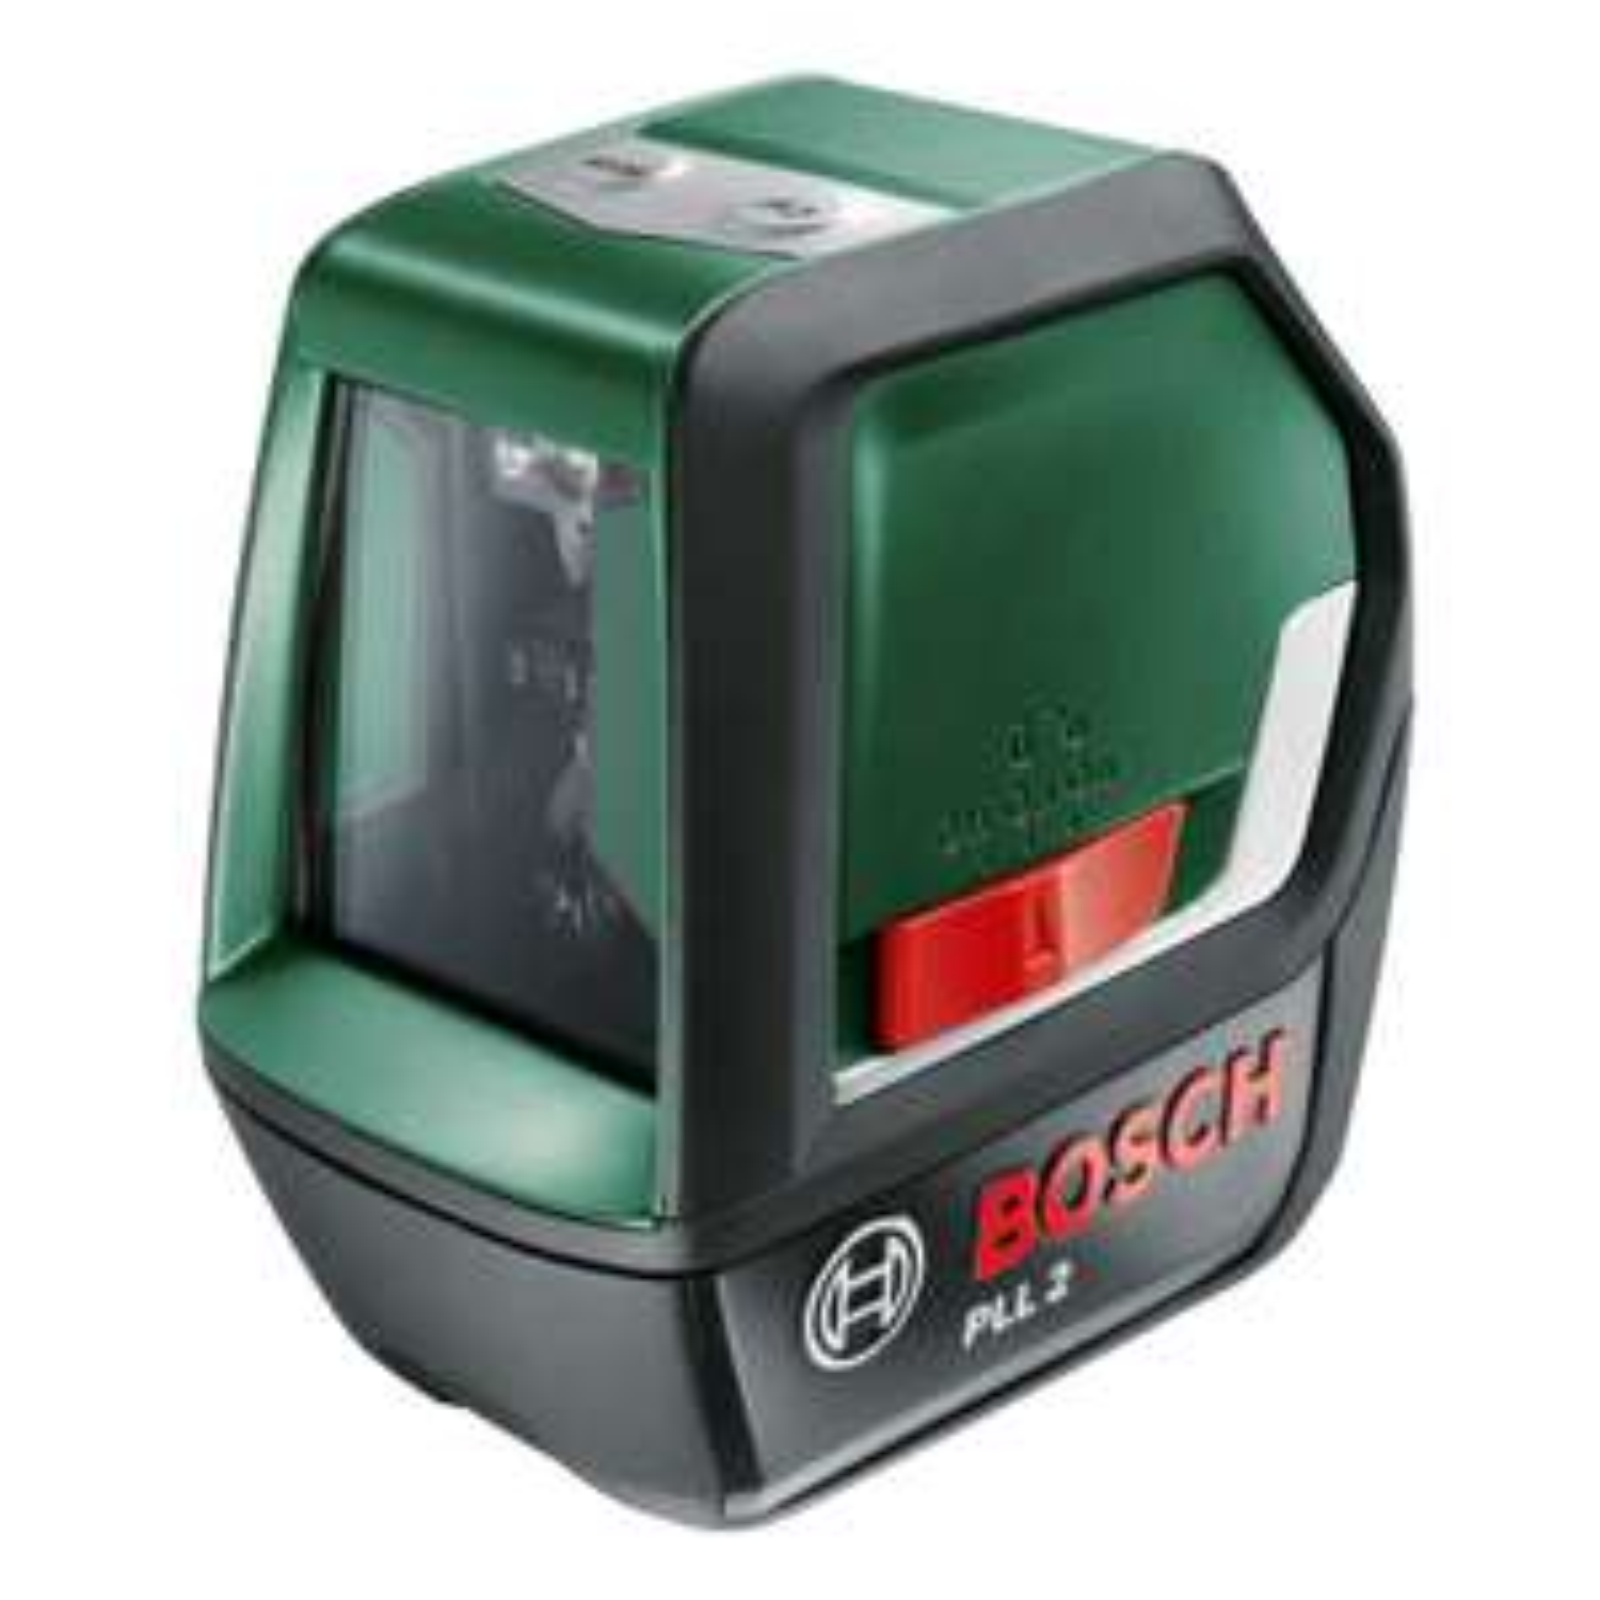 Bosch PLL 2 Cross Line Laser - £26.25 @ Homebase (Free C&C)